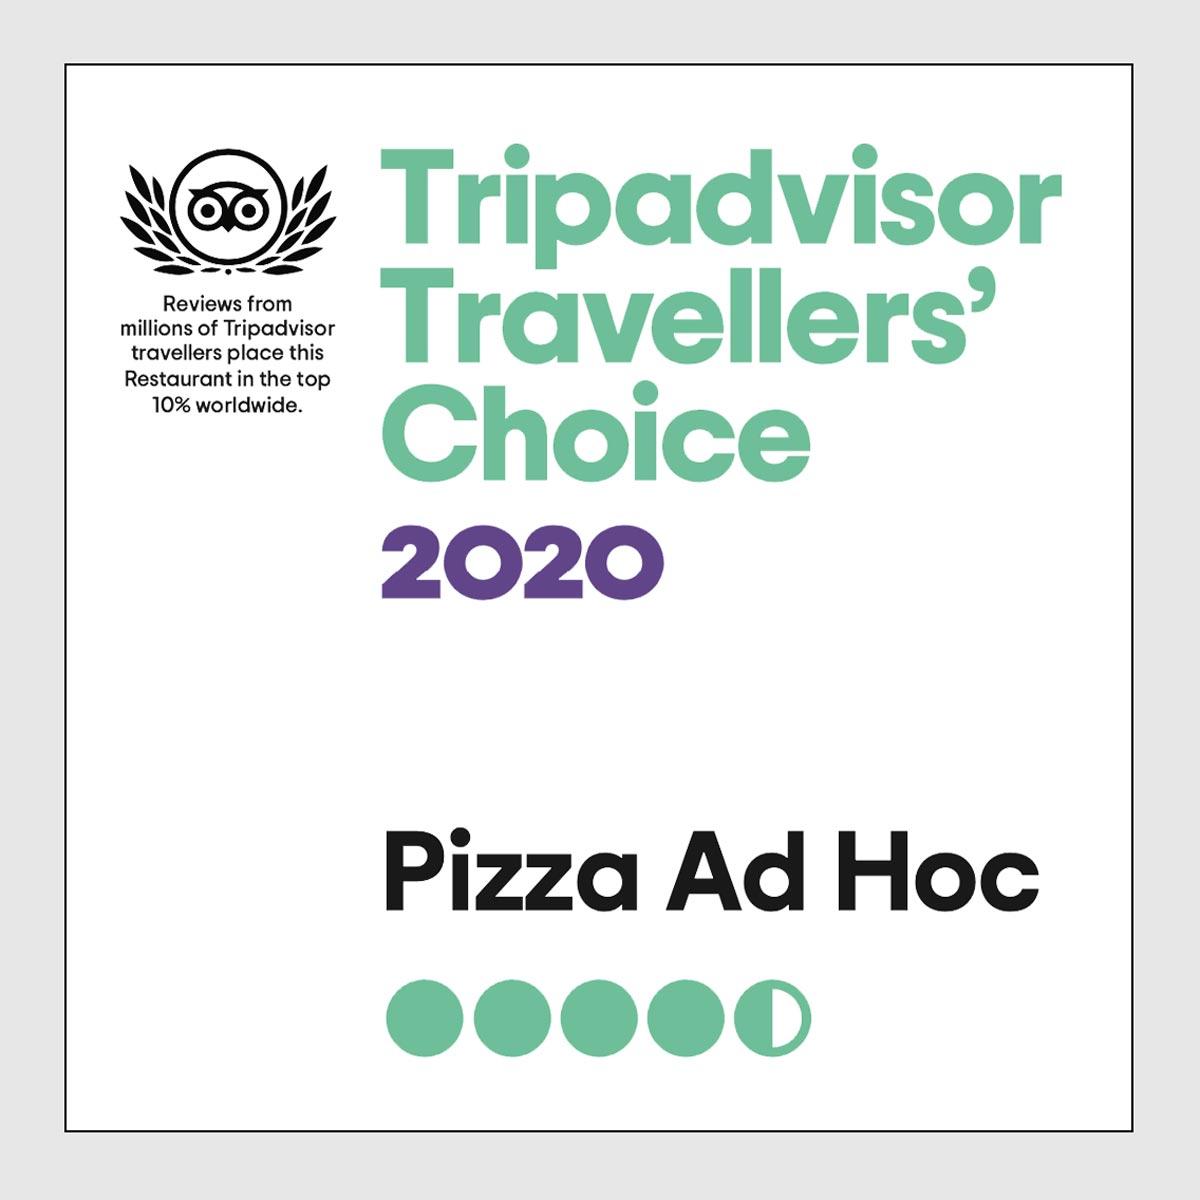 Tripadvisor Traveller's Choice 2020 - Pizza Ad Hoc Torino